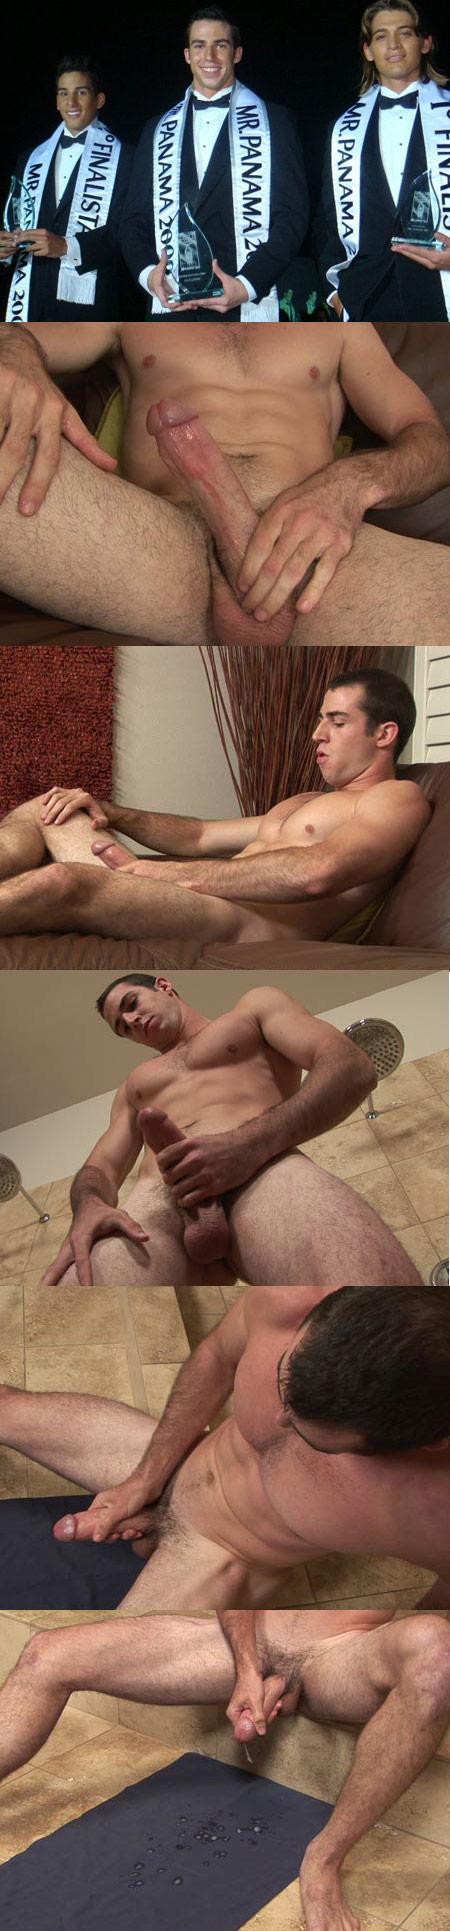 Karyn parsons naked pics